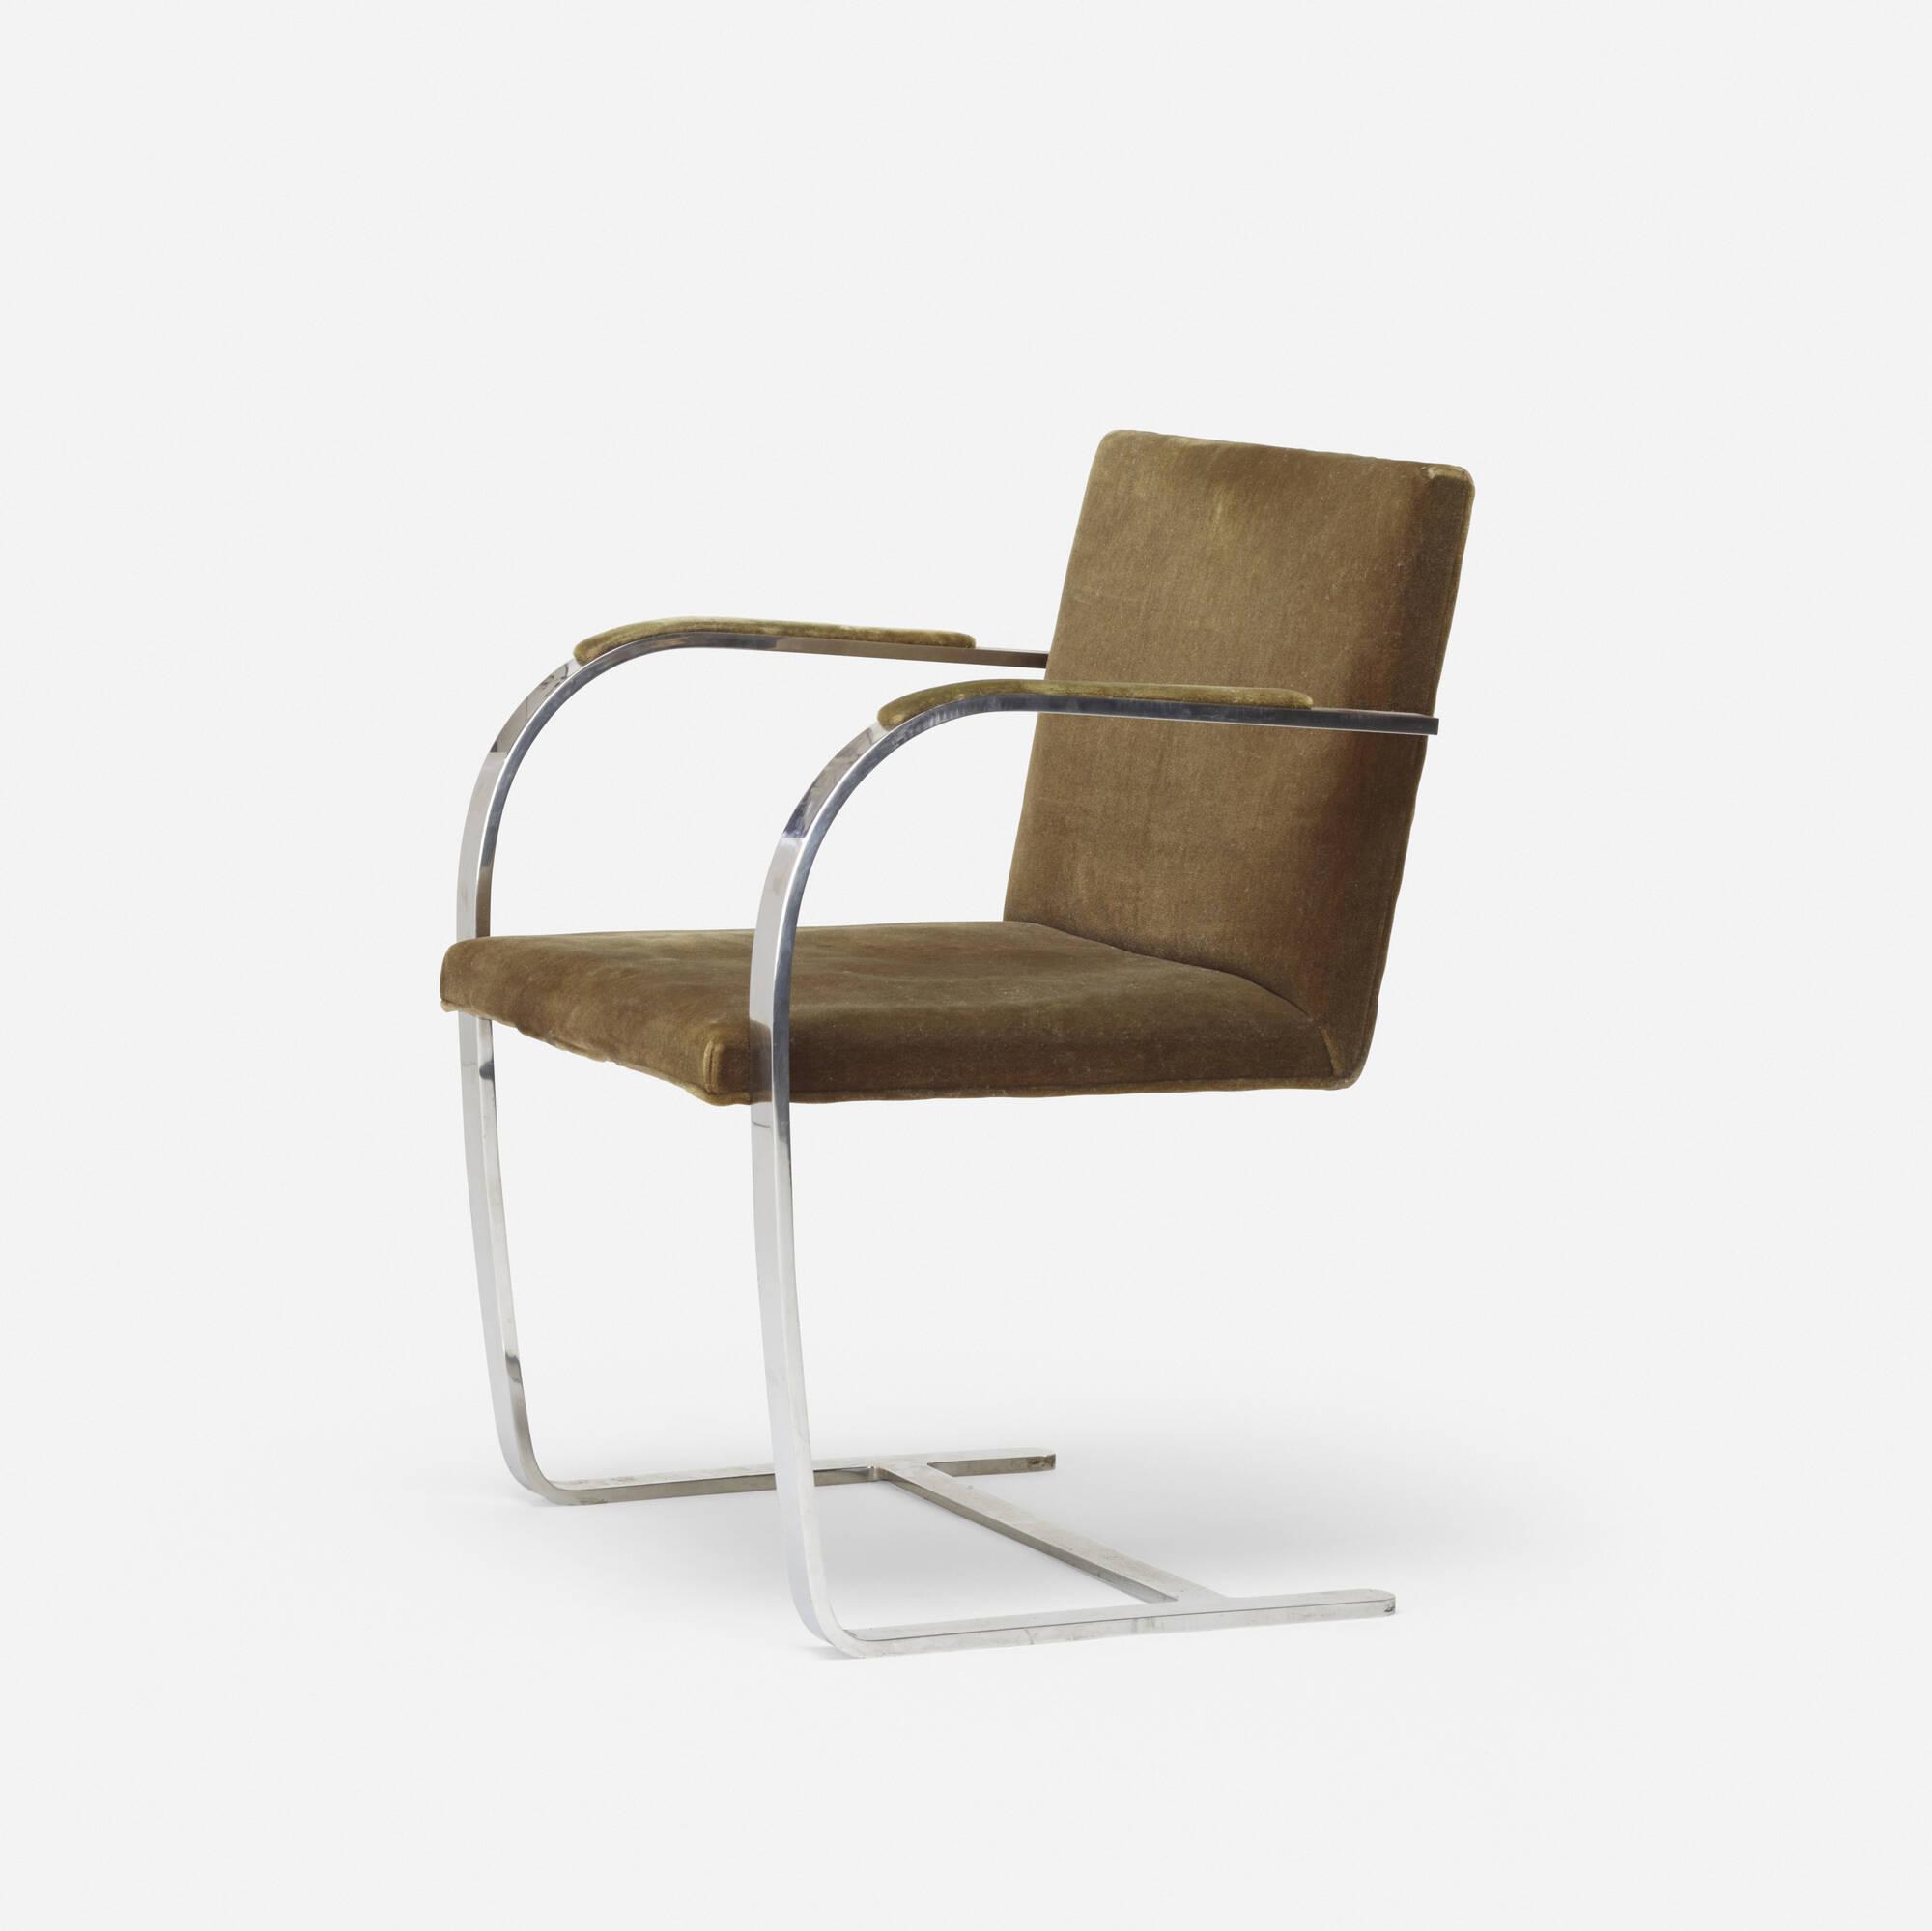 569: Ludwig Mies van der Rohe / Brno chair (1 of 2)